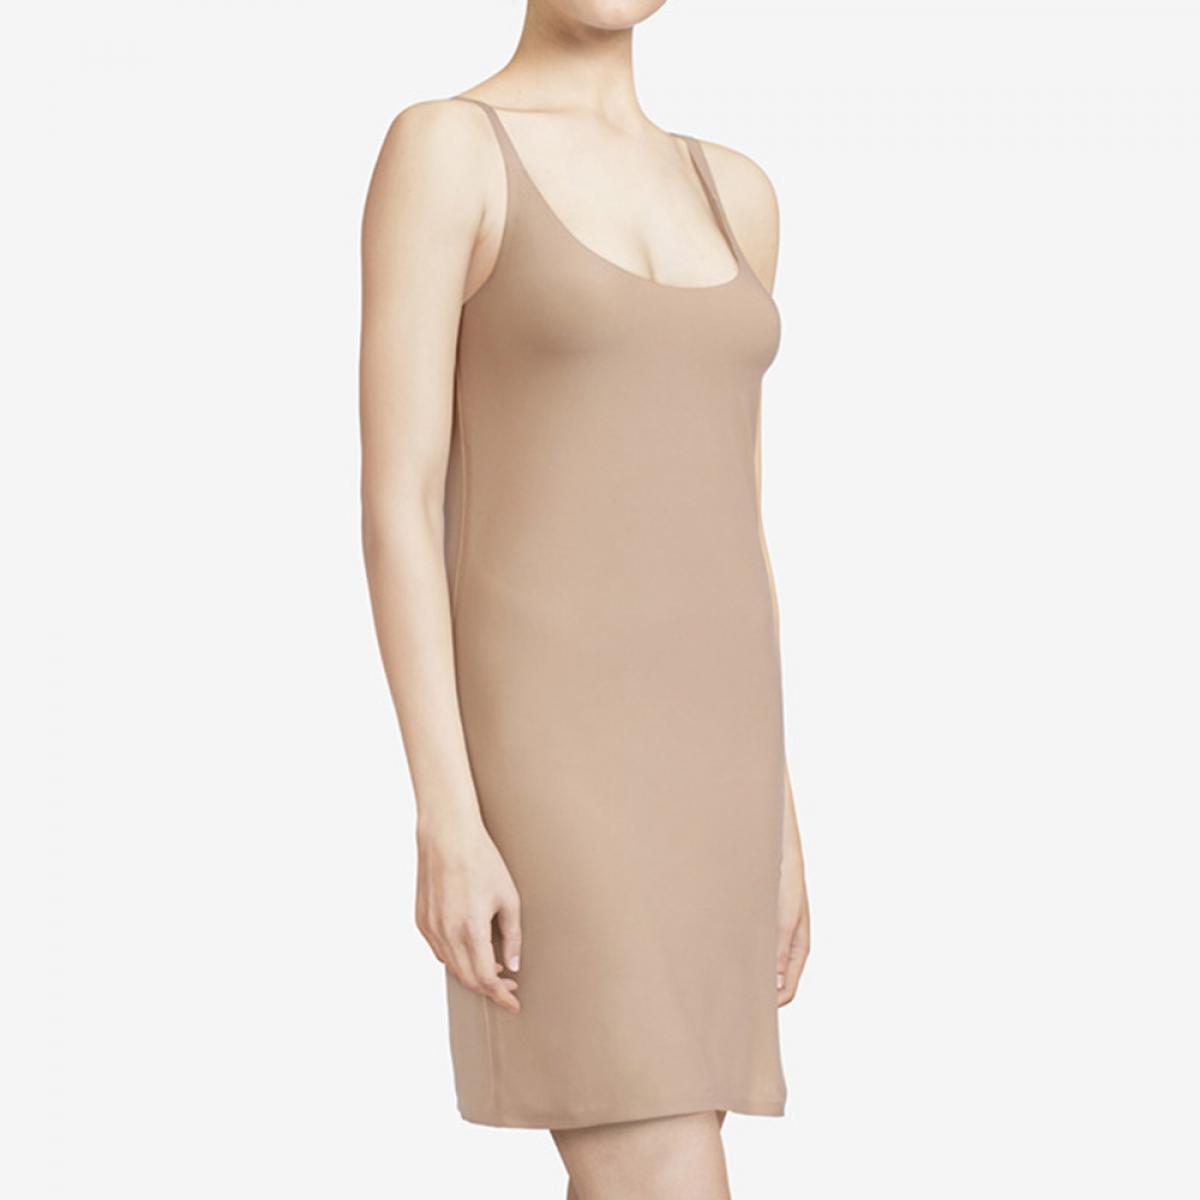 Fond de Robe nude - Chantelle - Modalova